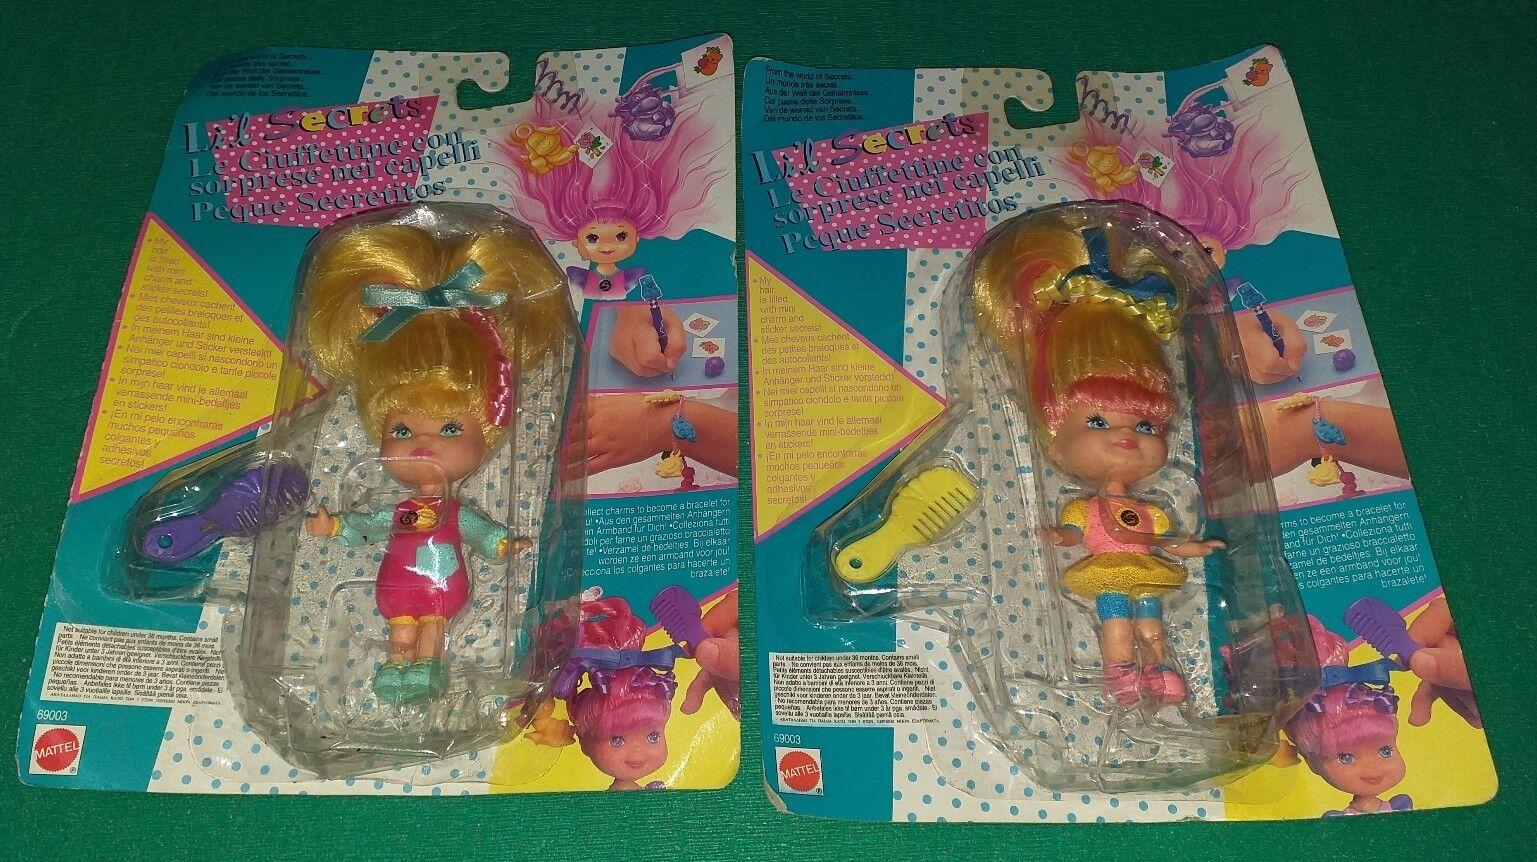 a precios asequibles 2 Lil secrets Le Ciuffettine Mattel Vintage 1993 1993 1993  80% de descuento